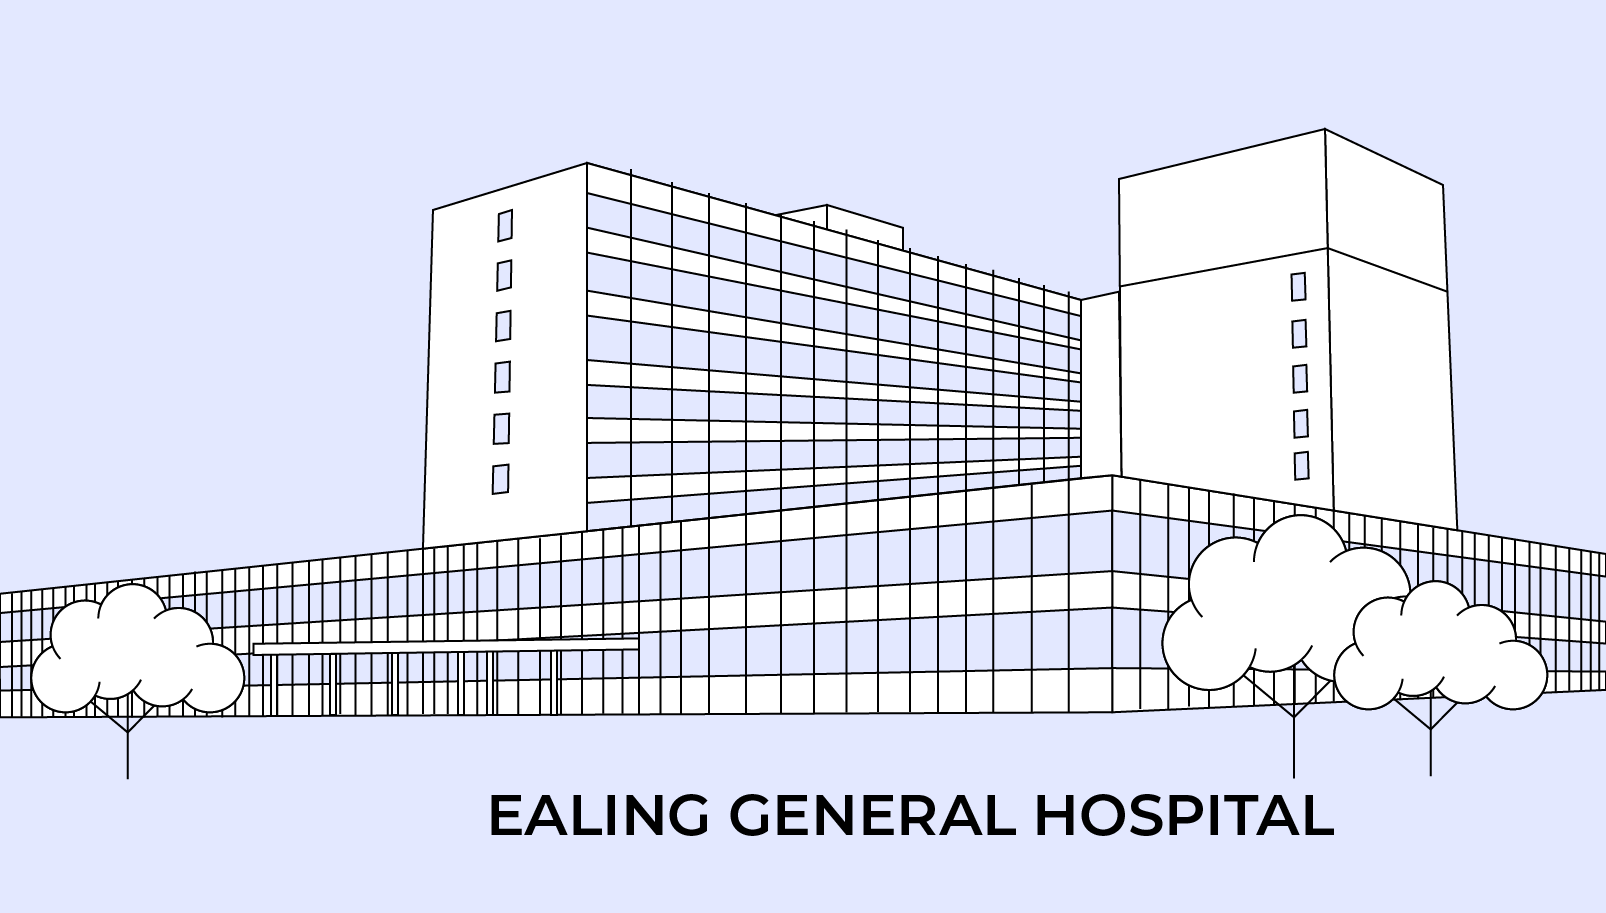 Ealing General Hospital